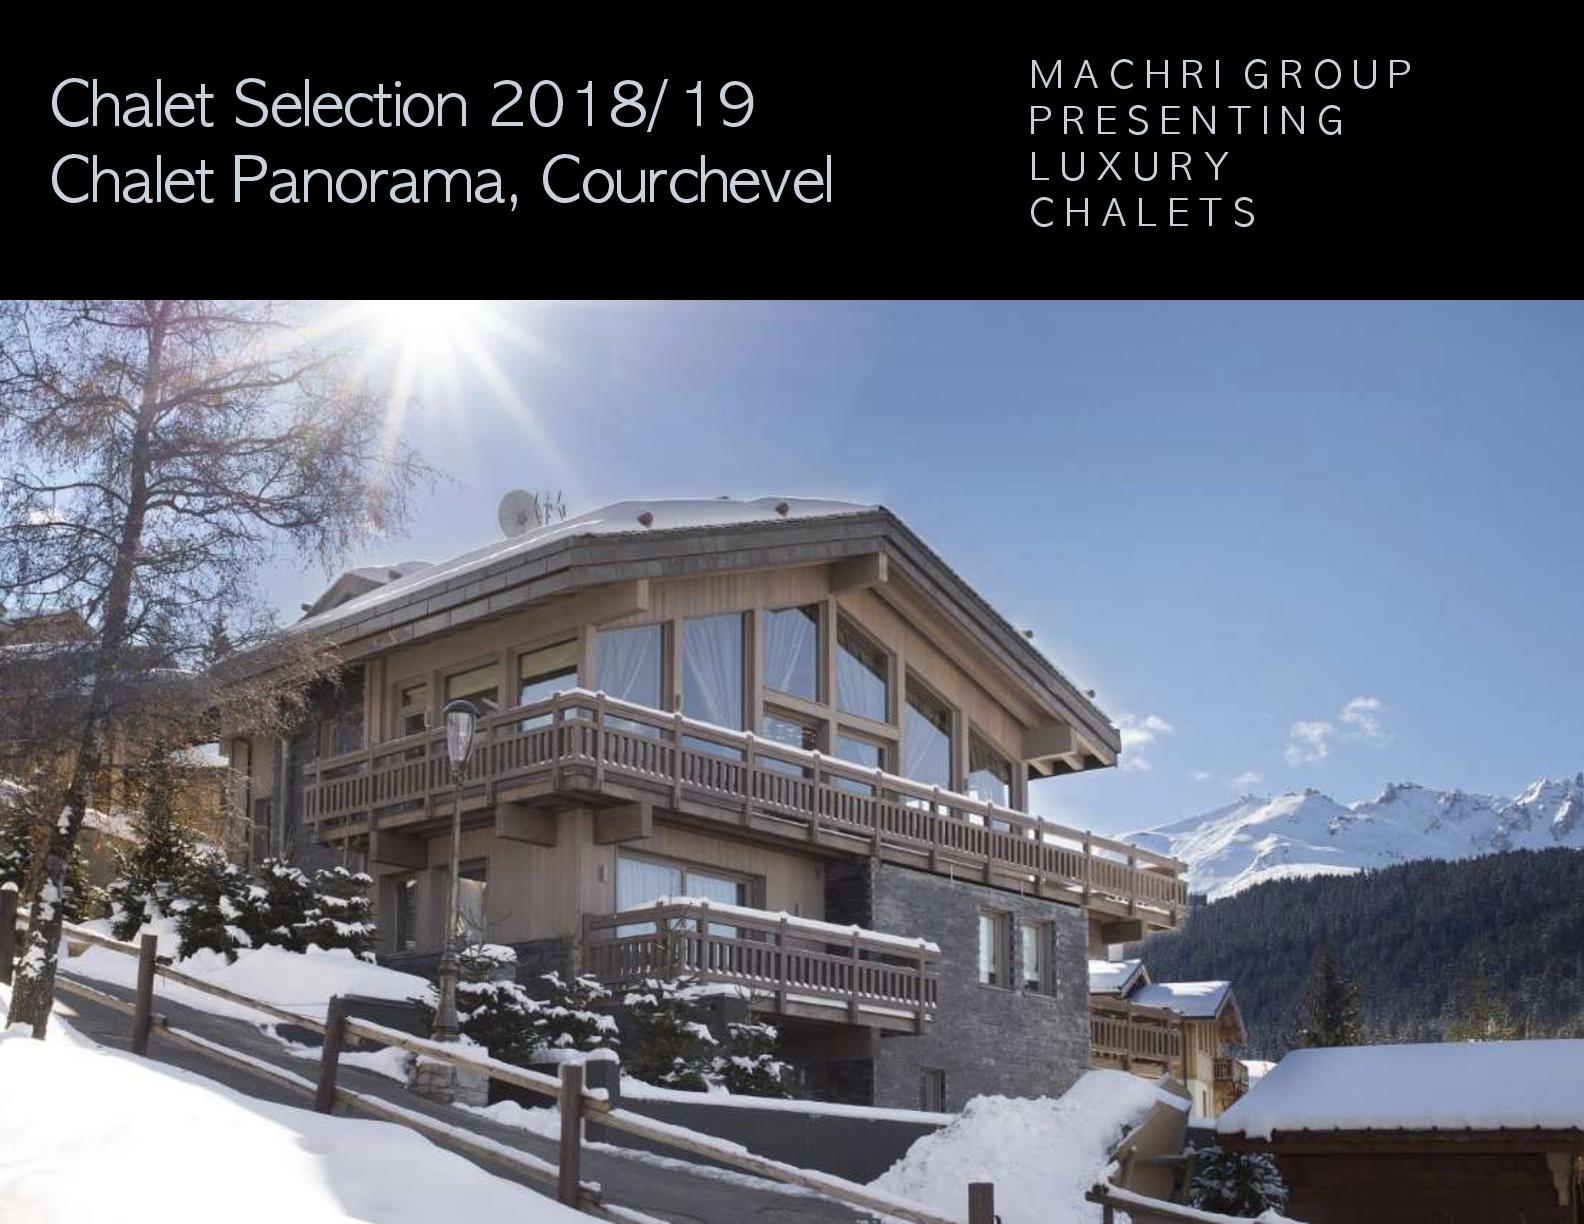 Chalet-Panorama,-Courchevel--ilovepdf-compressed-001